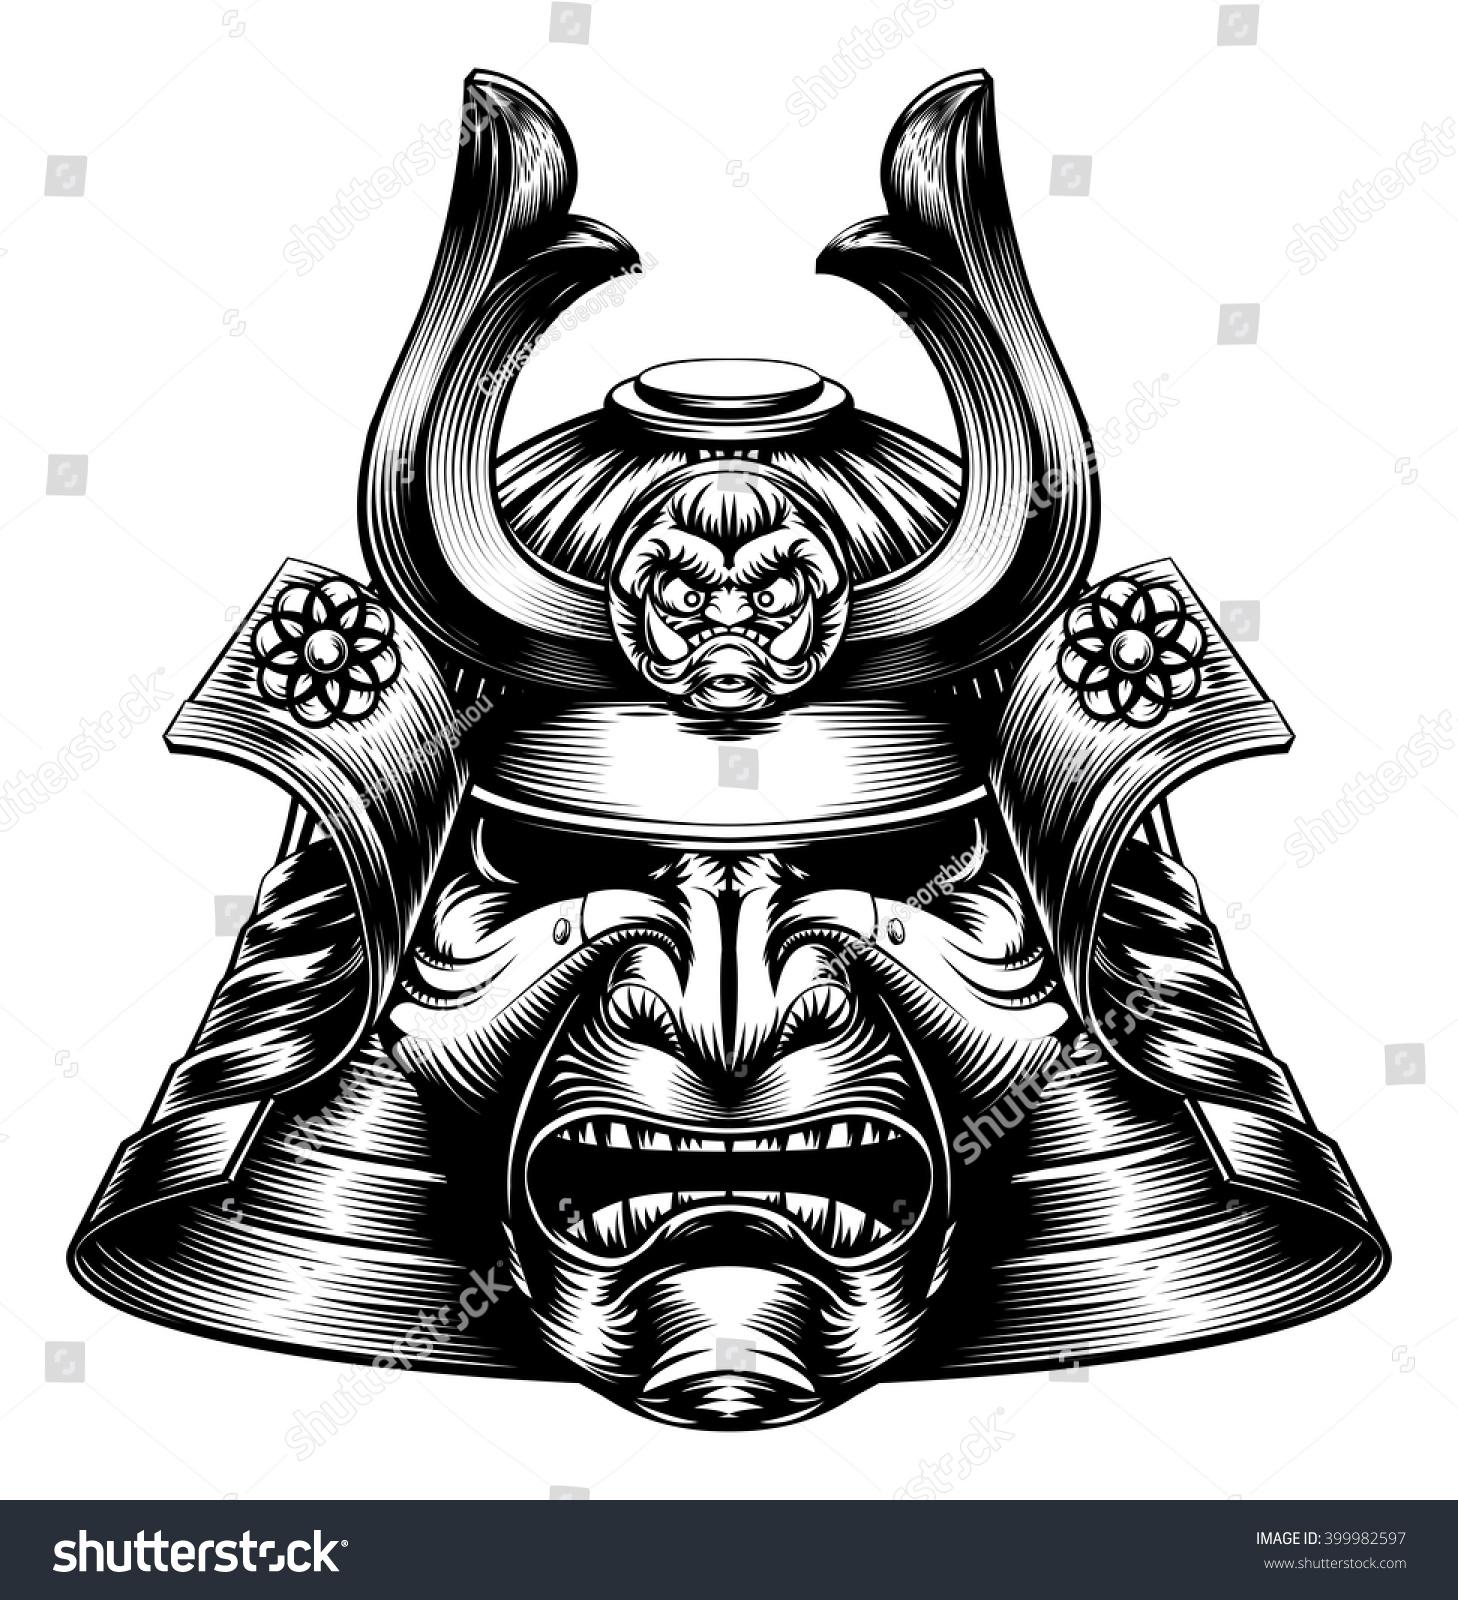 Japanese Samurai Mask Helmet Woodcut Style Stock Vector